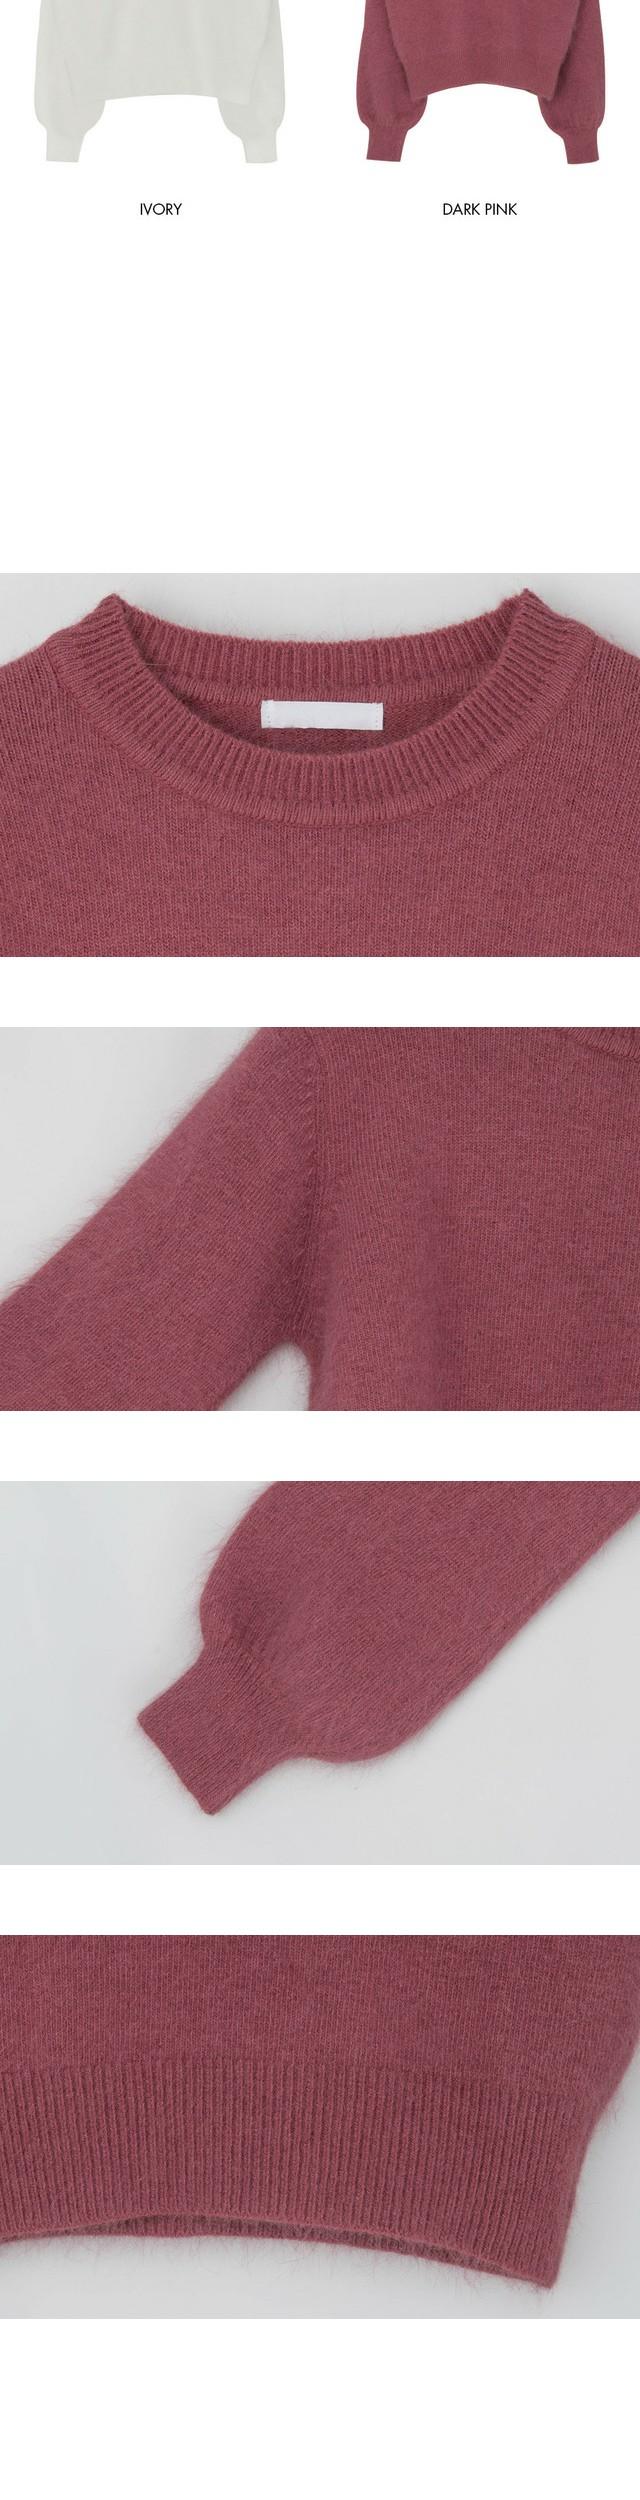 Round Angora Knit